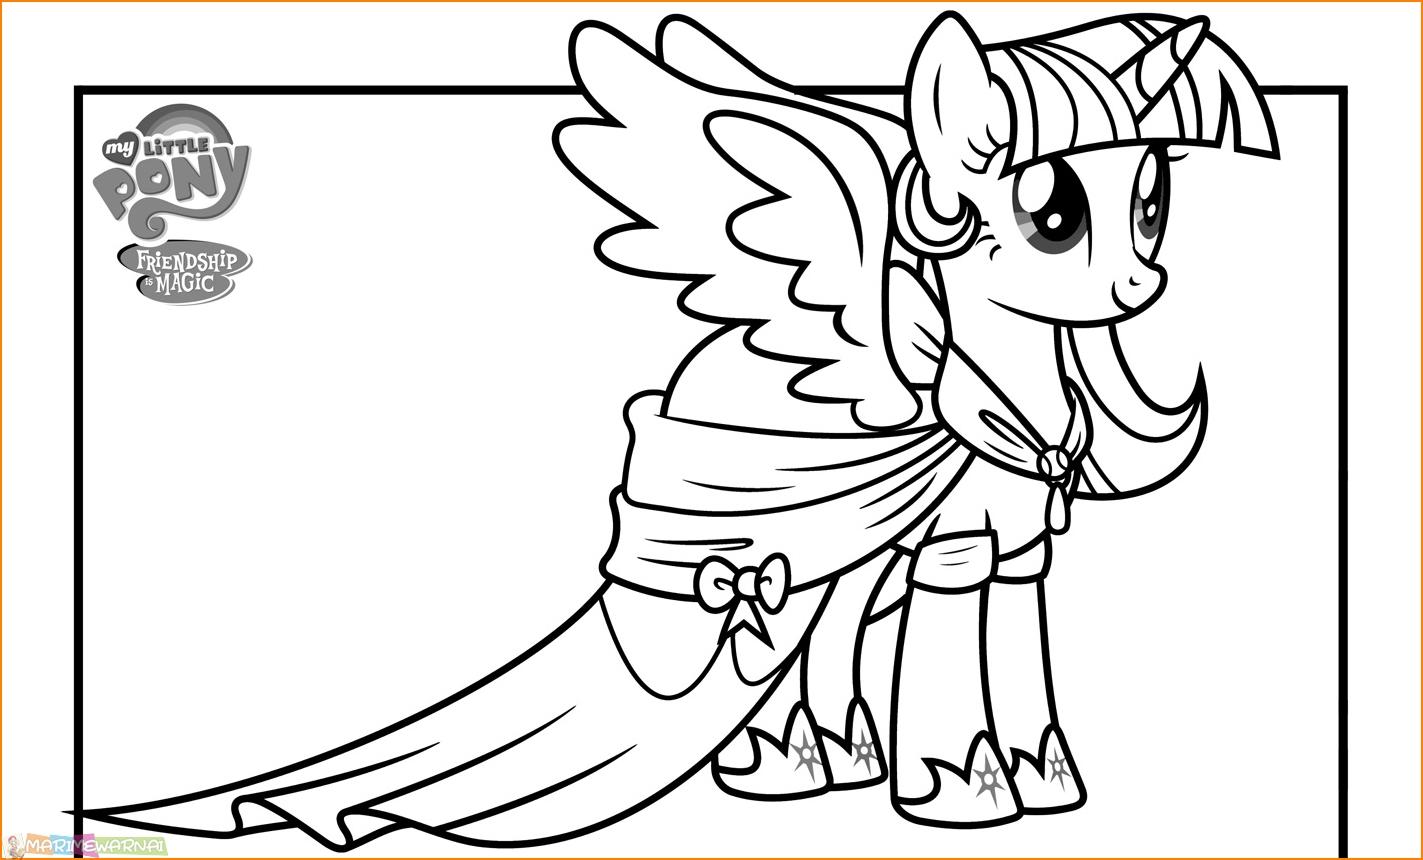 Berlatih Mewarnai Gambar Contoh Gambar Mewarnai My Little Pony